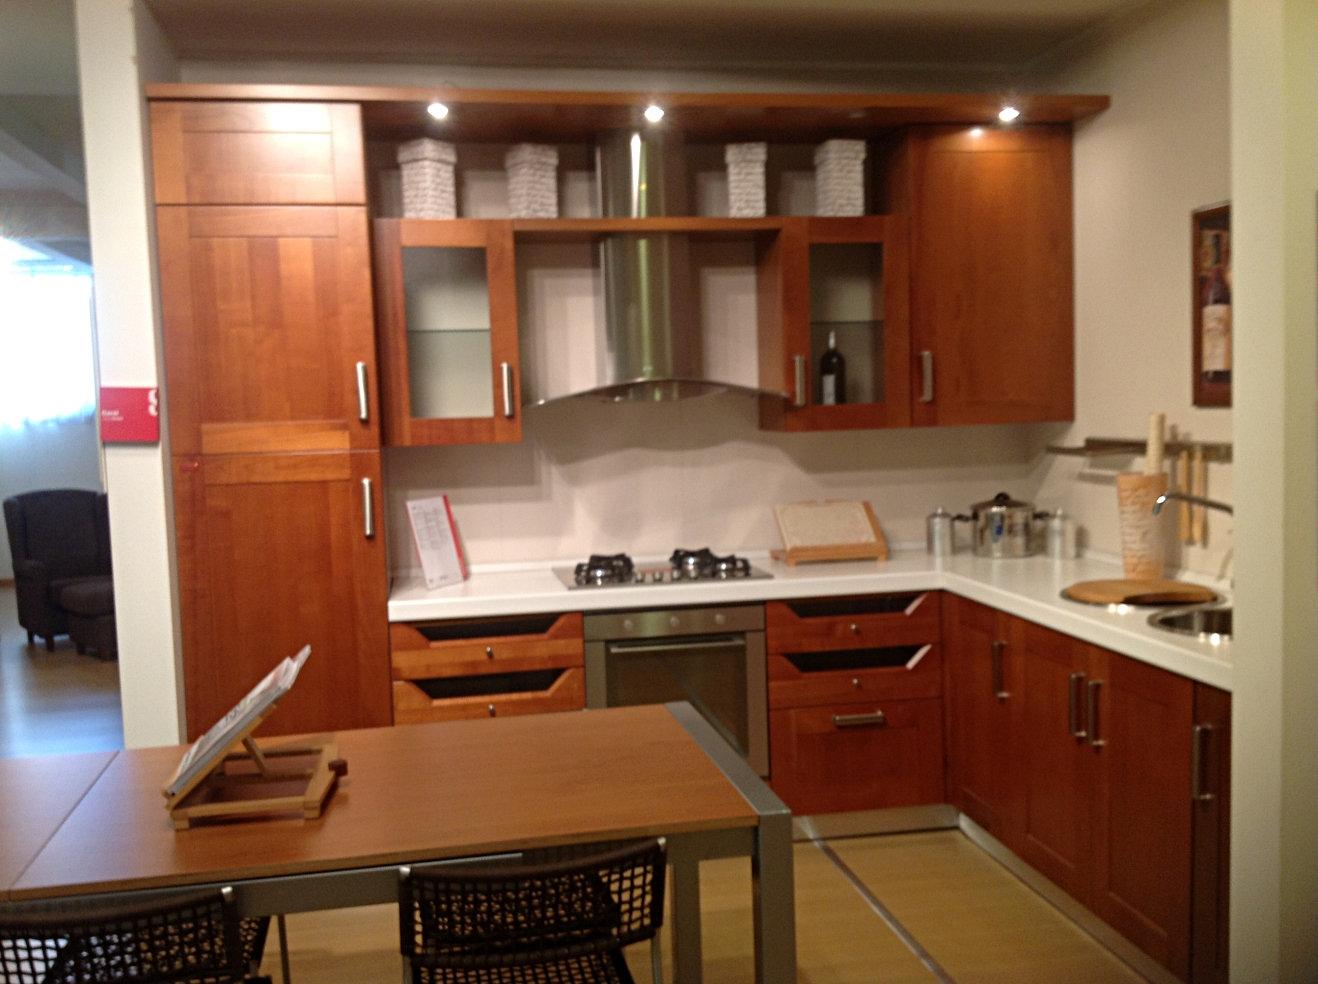 cucine moderne con isola prezzi cucine moderne nascoste cucine moderne ...